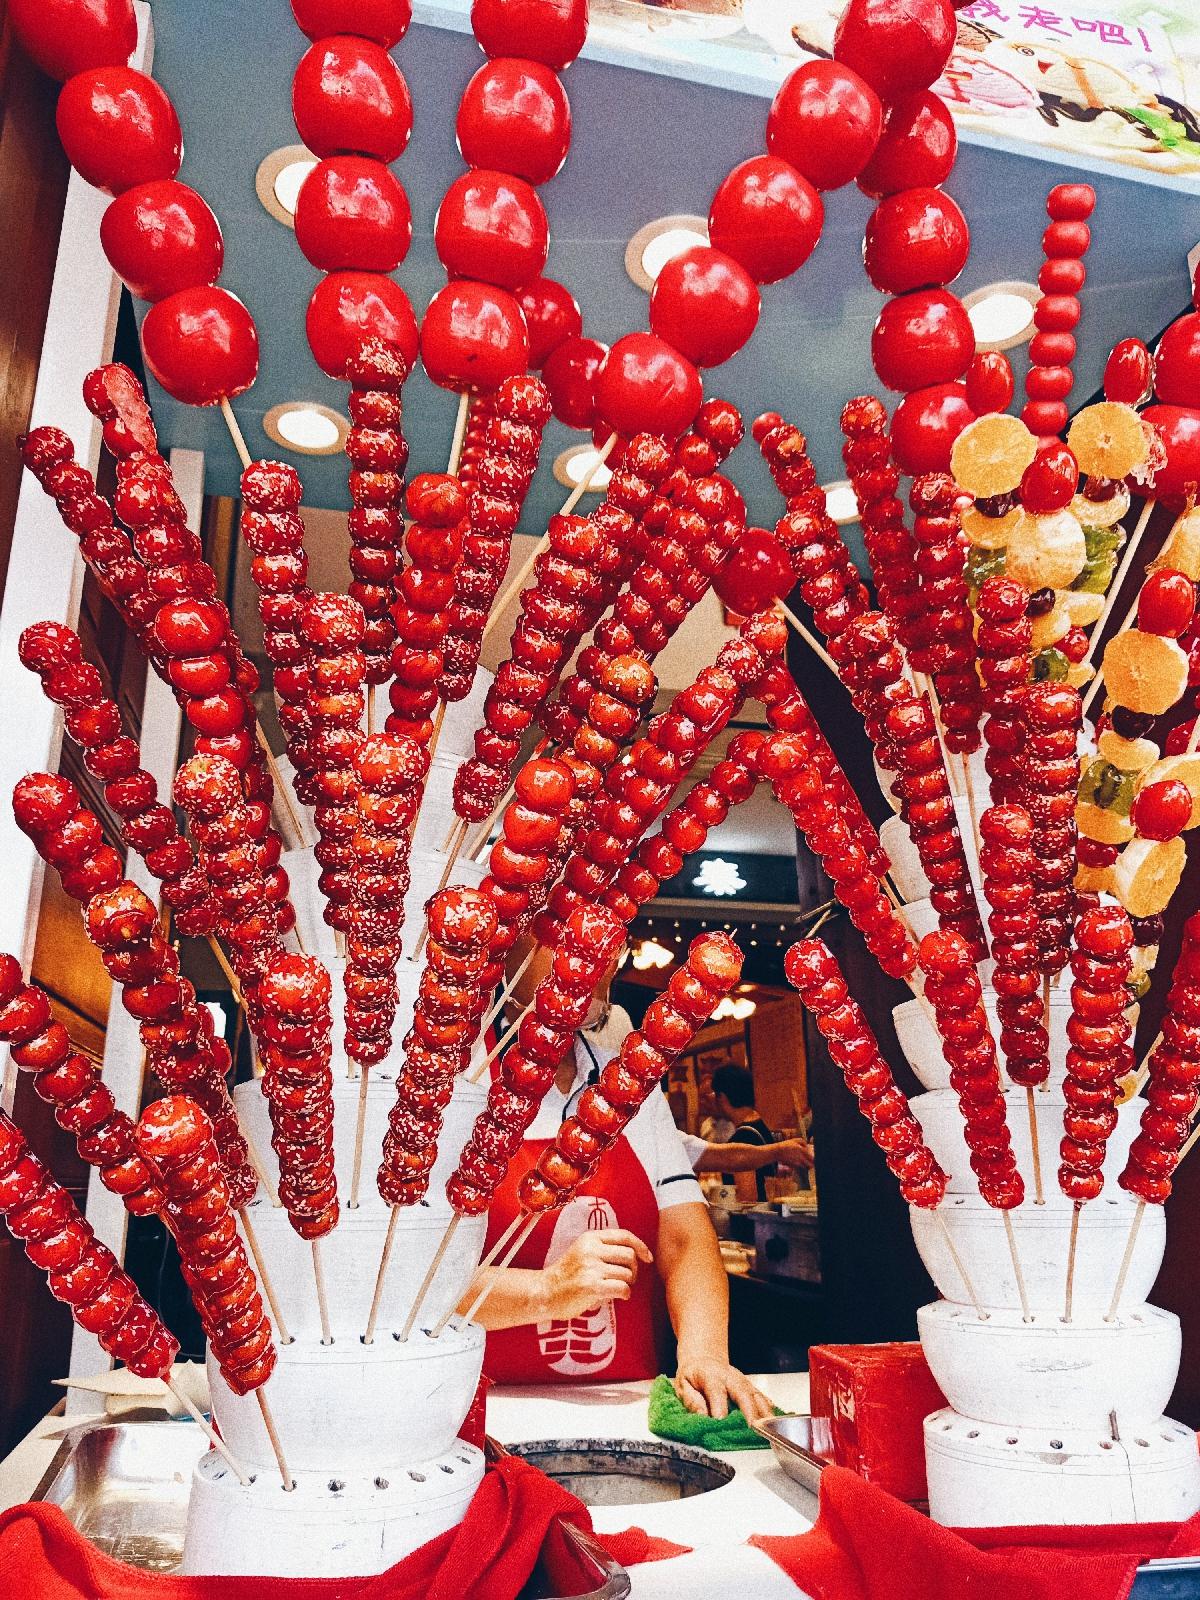 Tanghulu - Manisan Buah Tradisional Khas China - Rsjournal